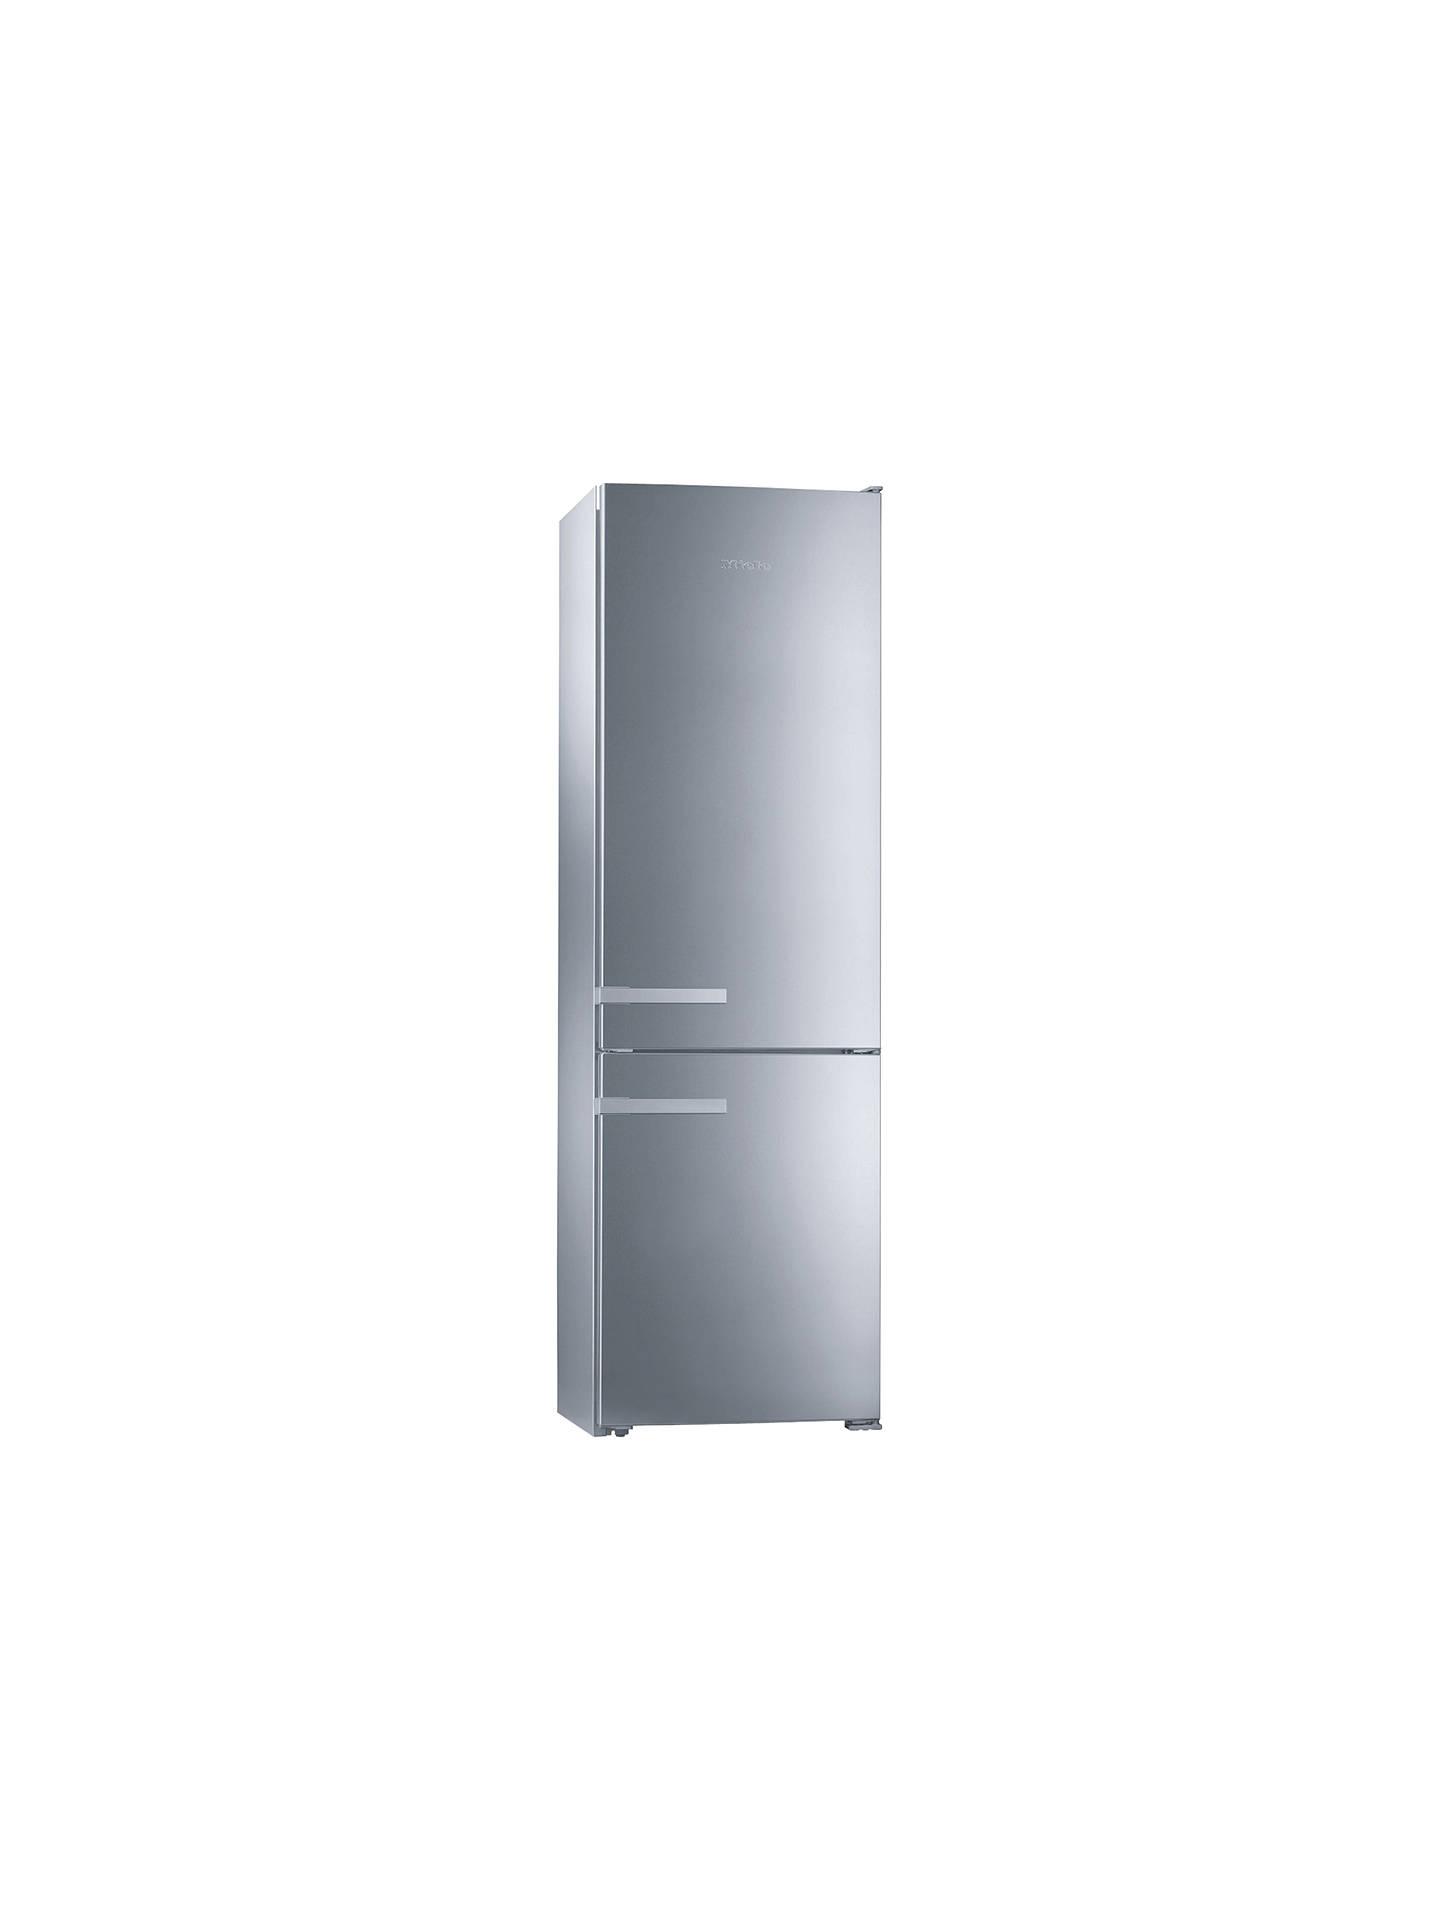 miele kfn12923 sd 2 fridge freezer stainless steel at john lewis rh johnlewis com